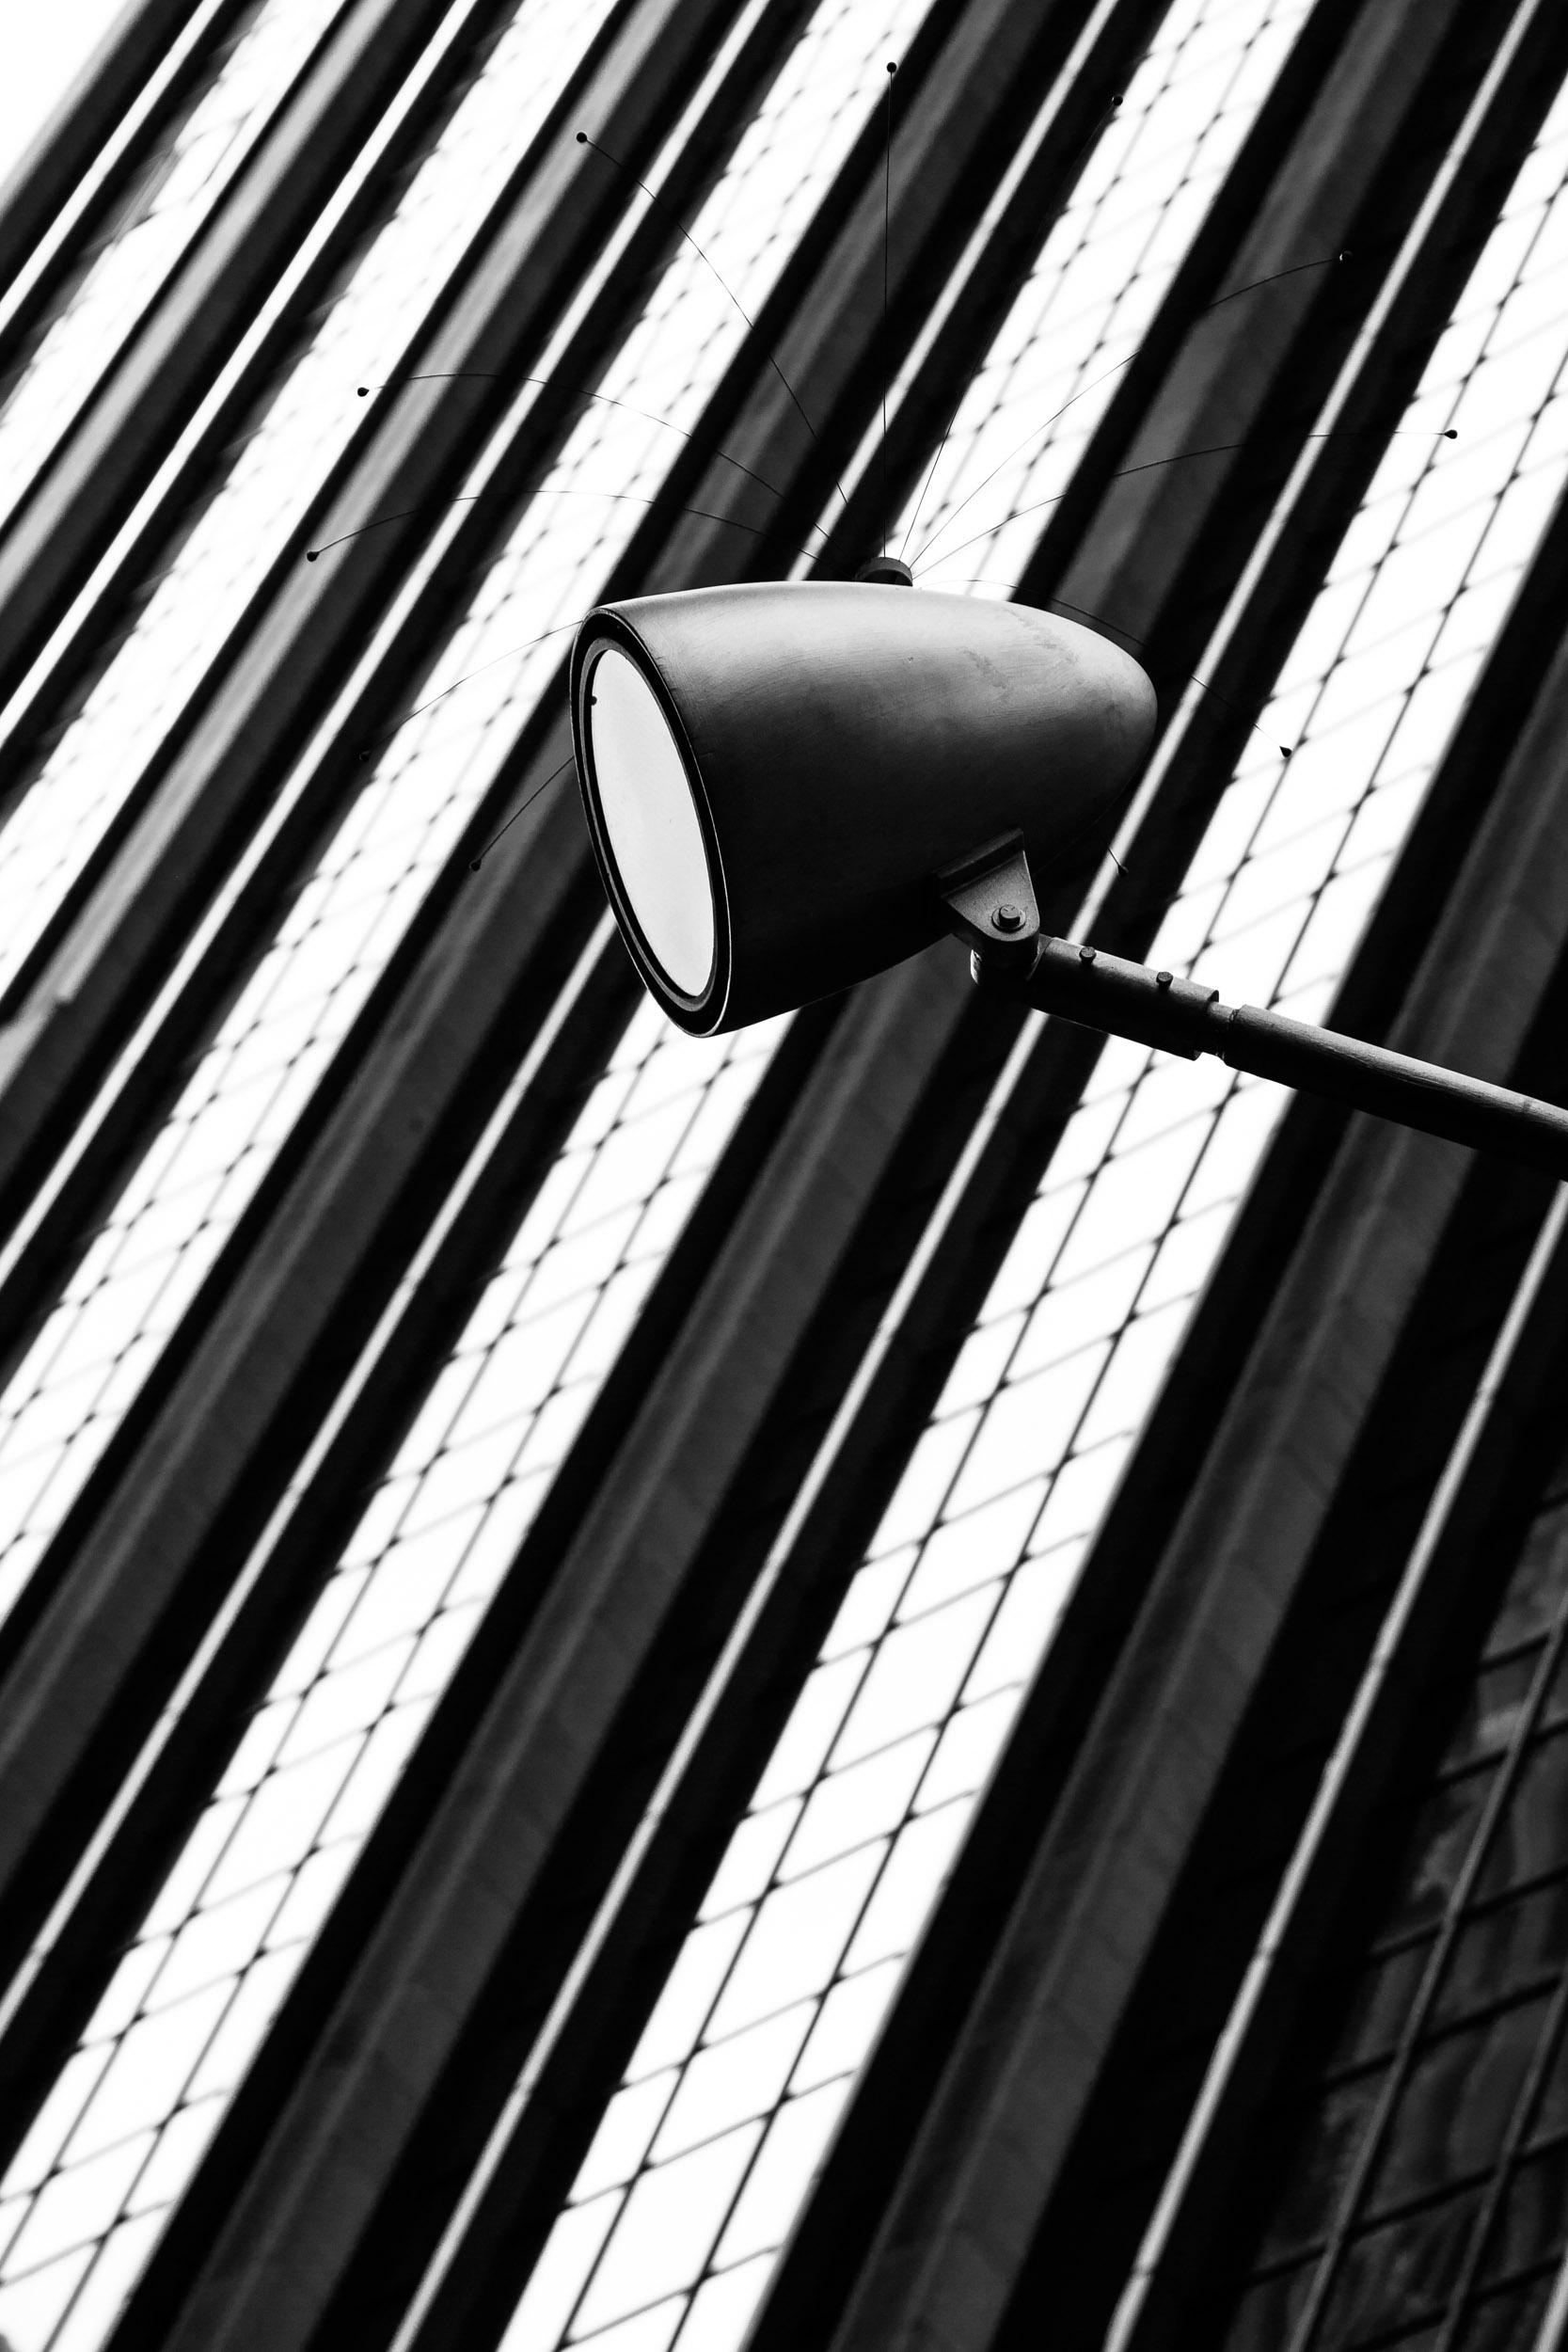 Streetlights of New York #43 New York, NY 2010